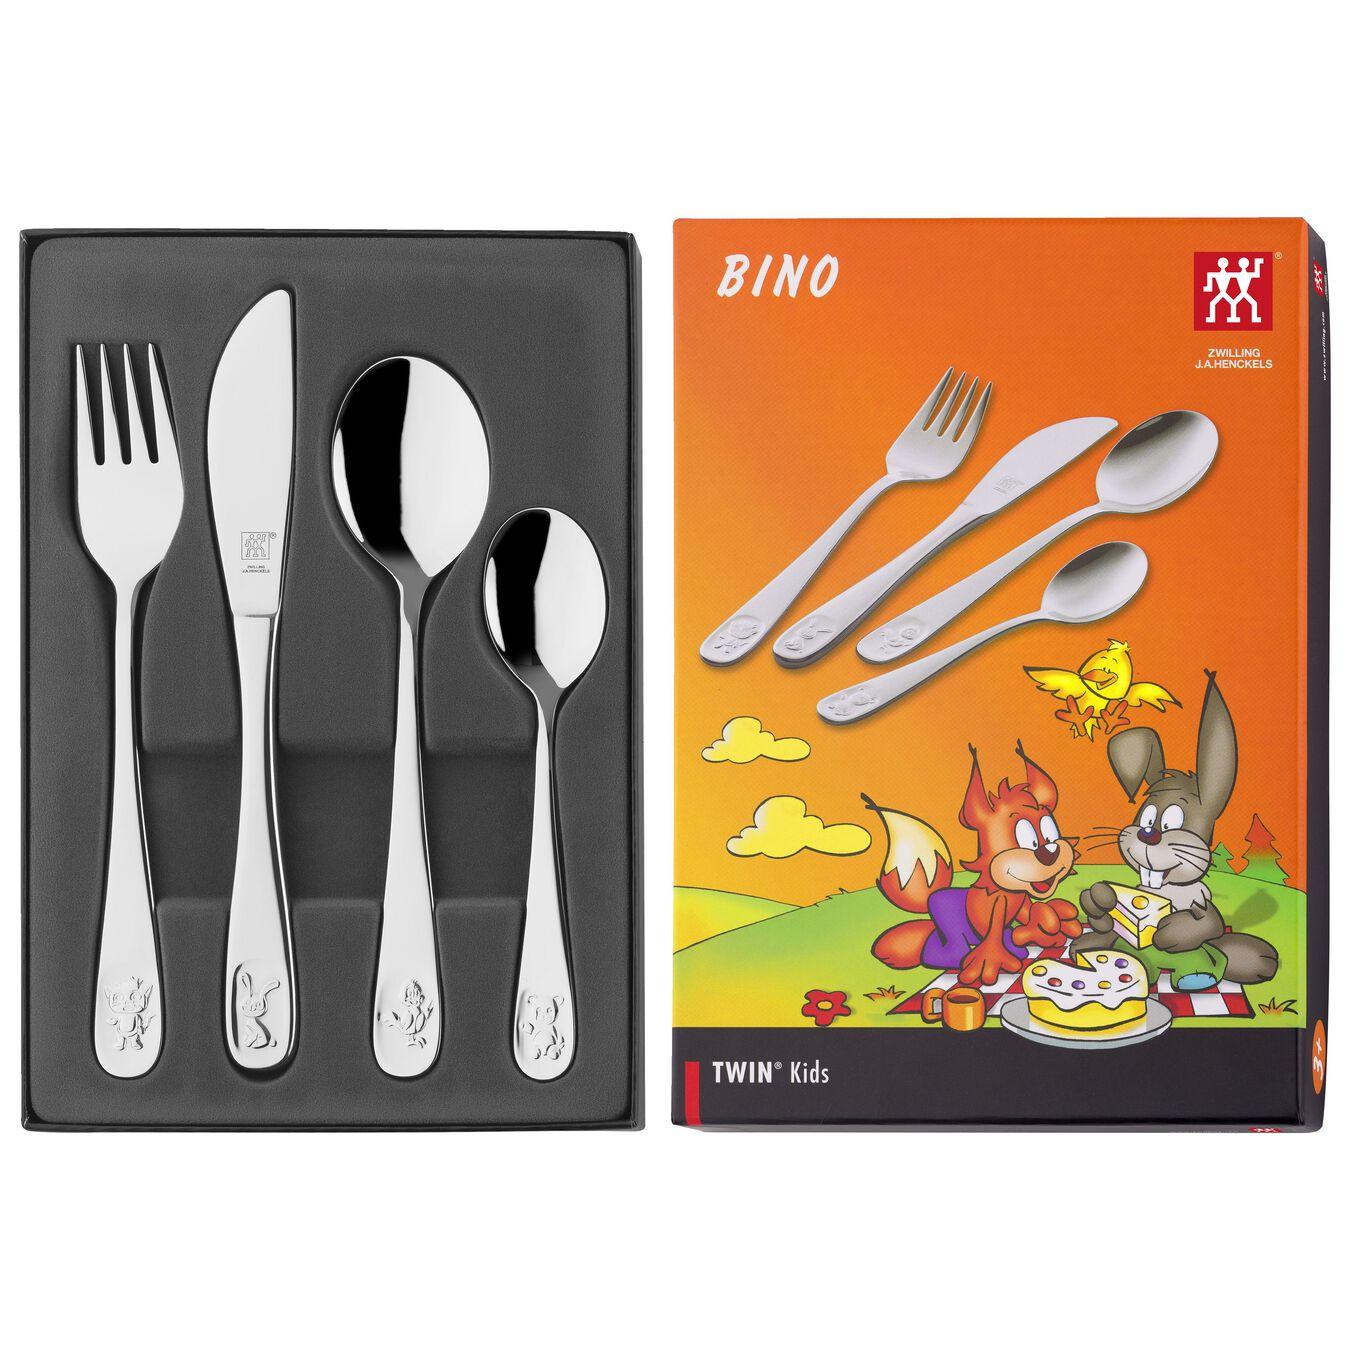 4-pc TWIN Kids  Bino Flatware Set, 18/10 Stainless Steel ,,large 3